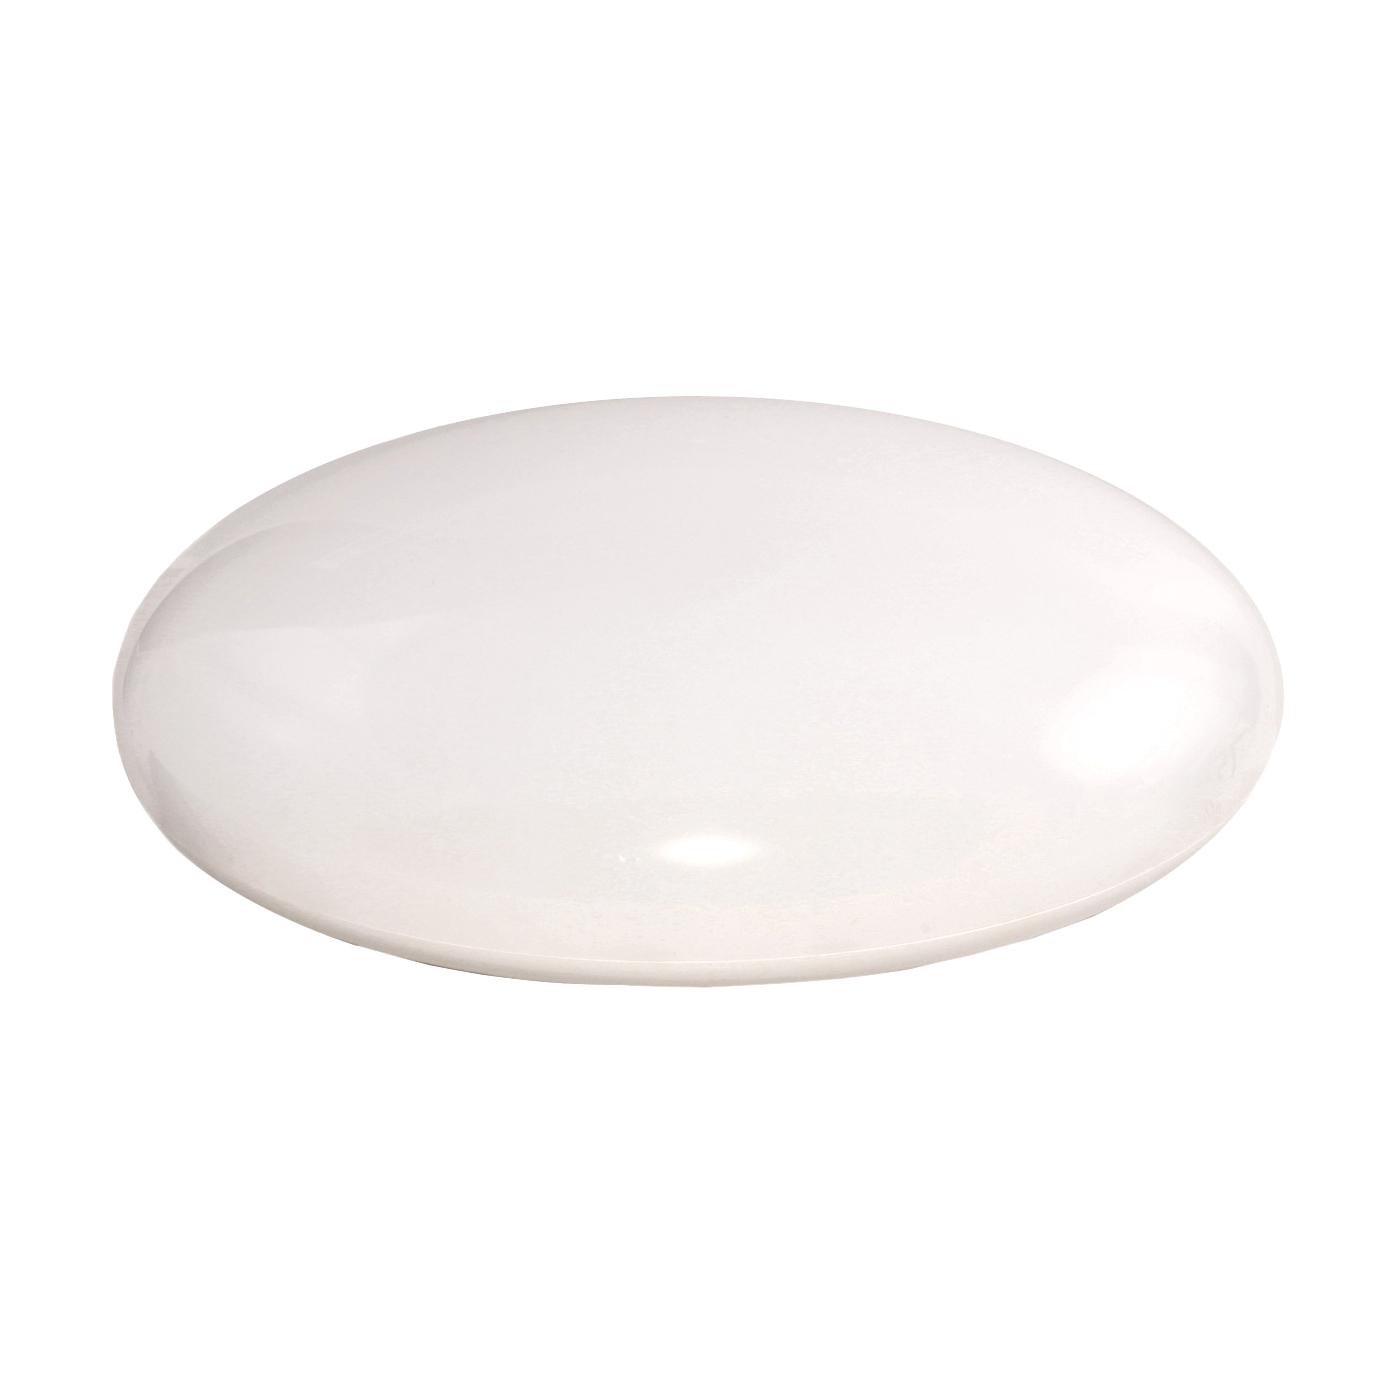 Picture of Sylvania 75124 Ceiling Light, 120 V, 31 W, LED Lamp, 2500 Lumens, 4000 K Color Temp